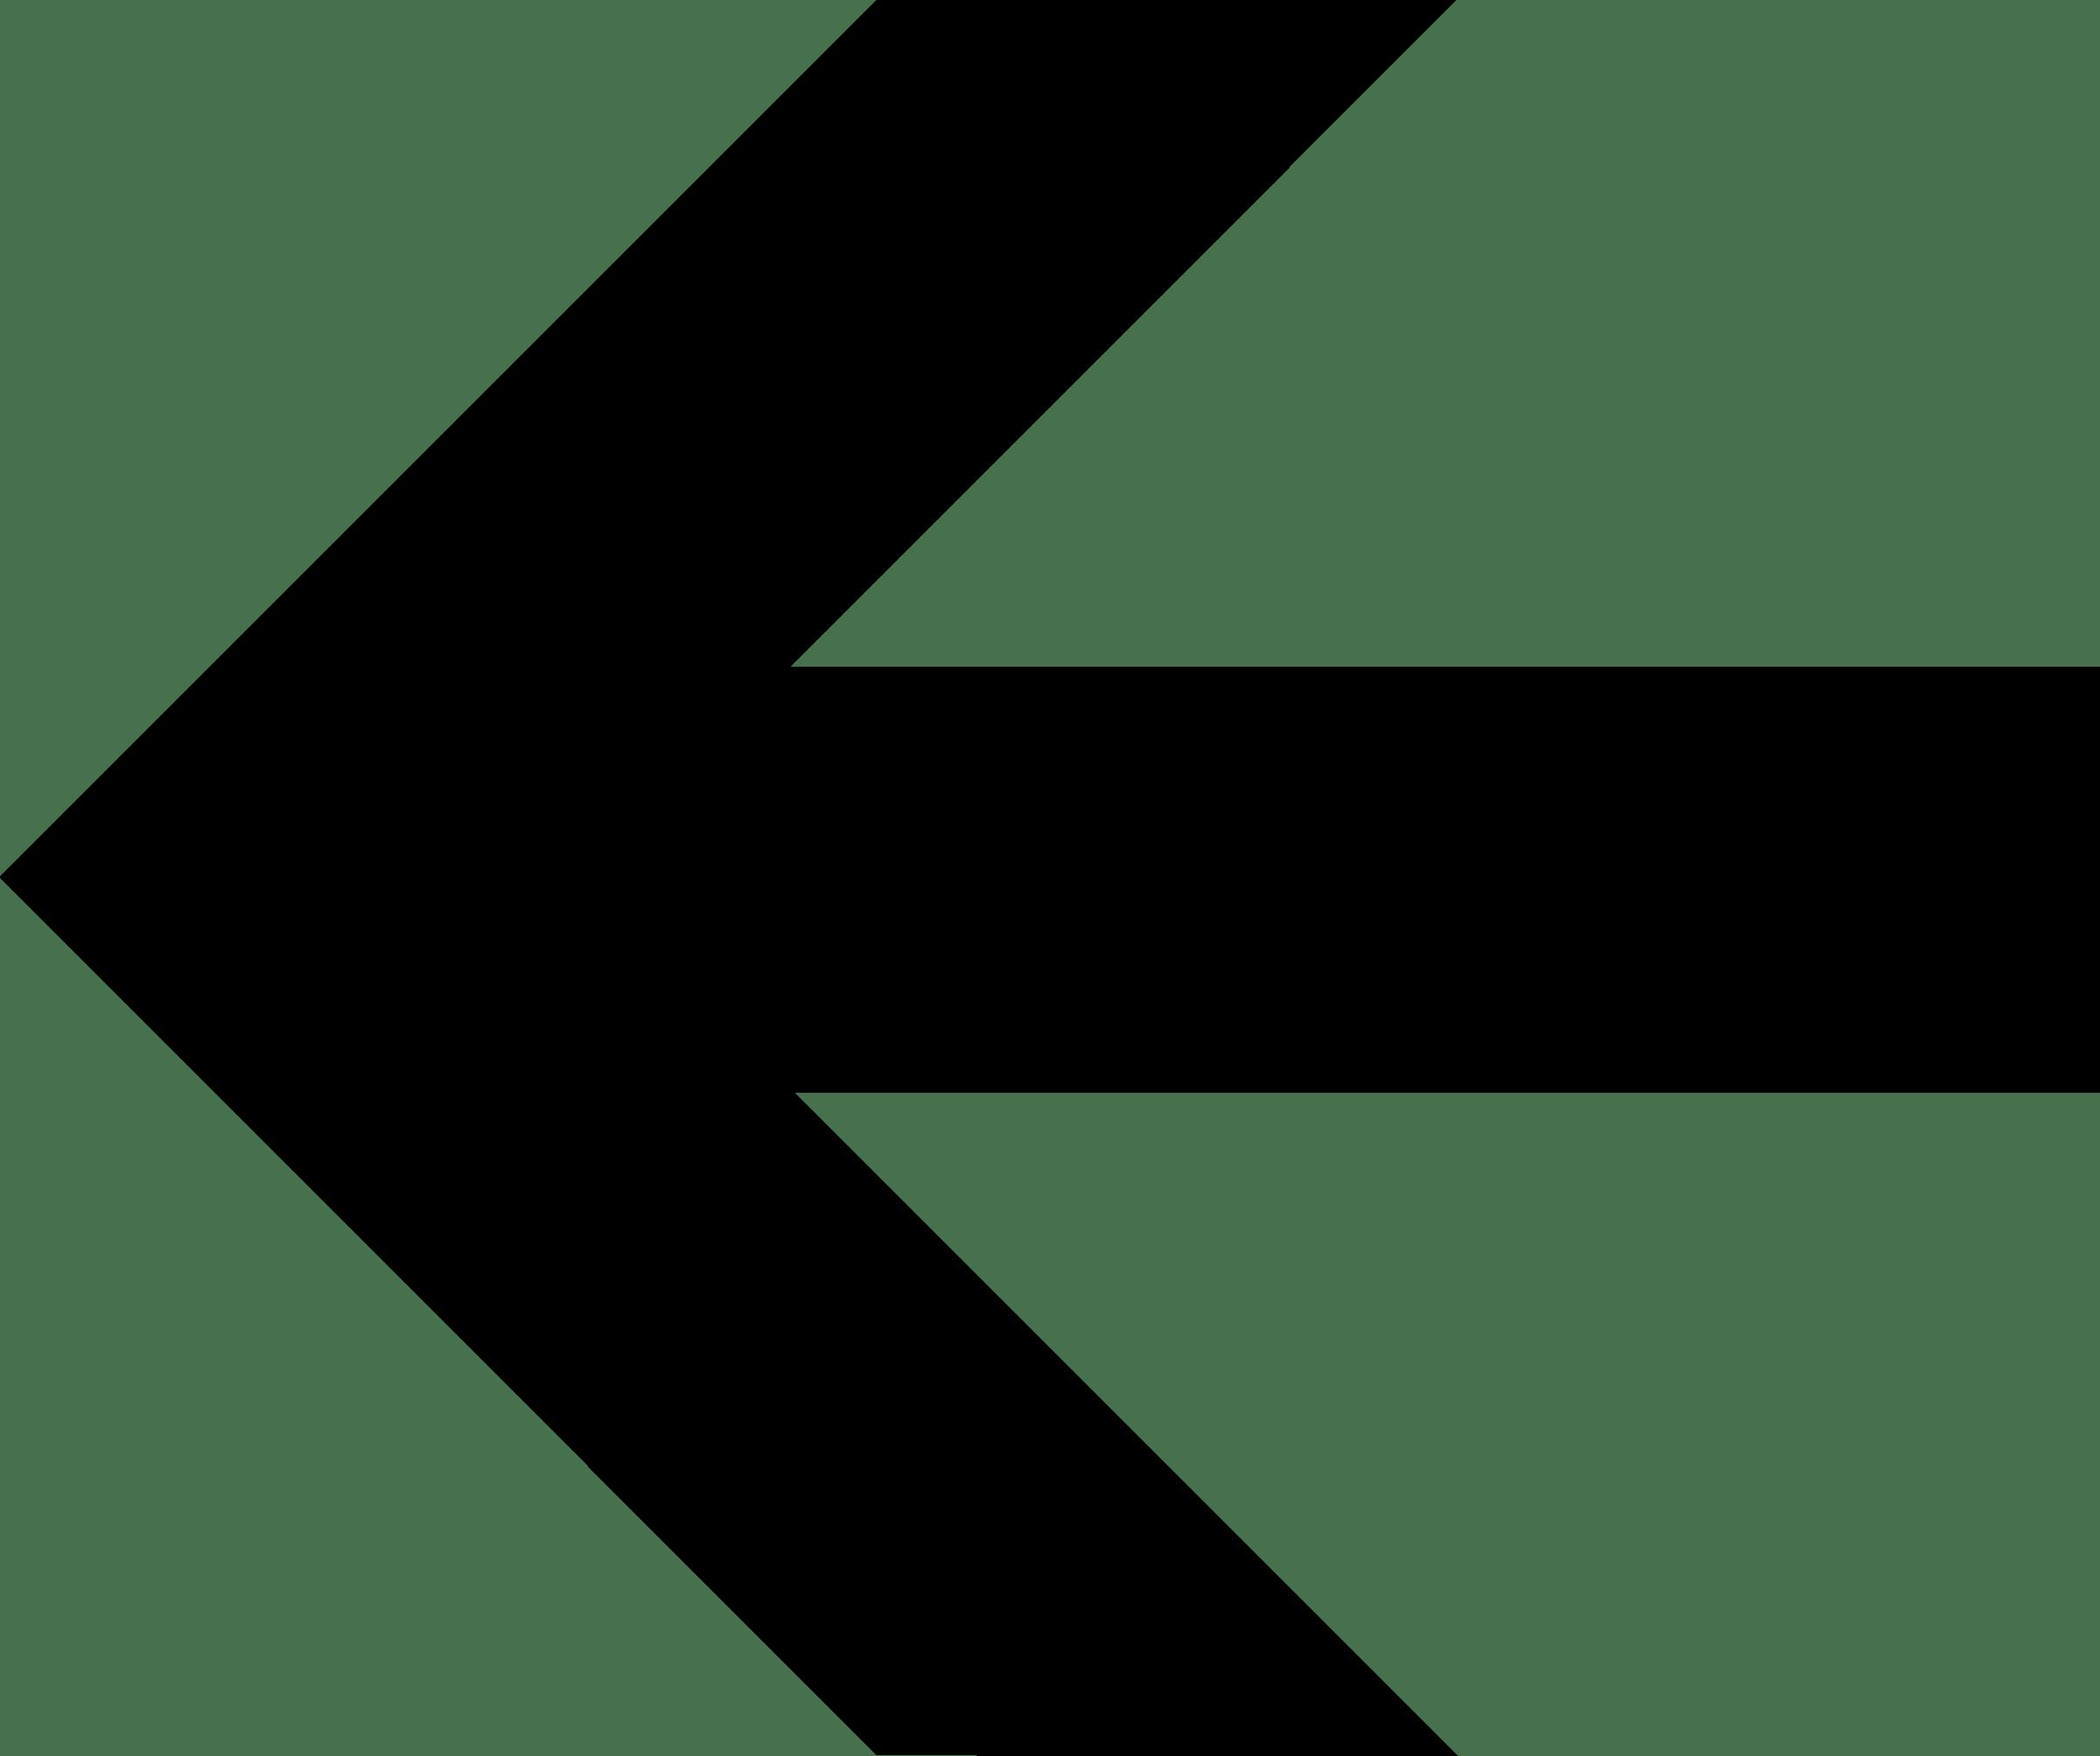 bold arrow left transparent png stickpng